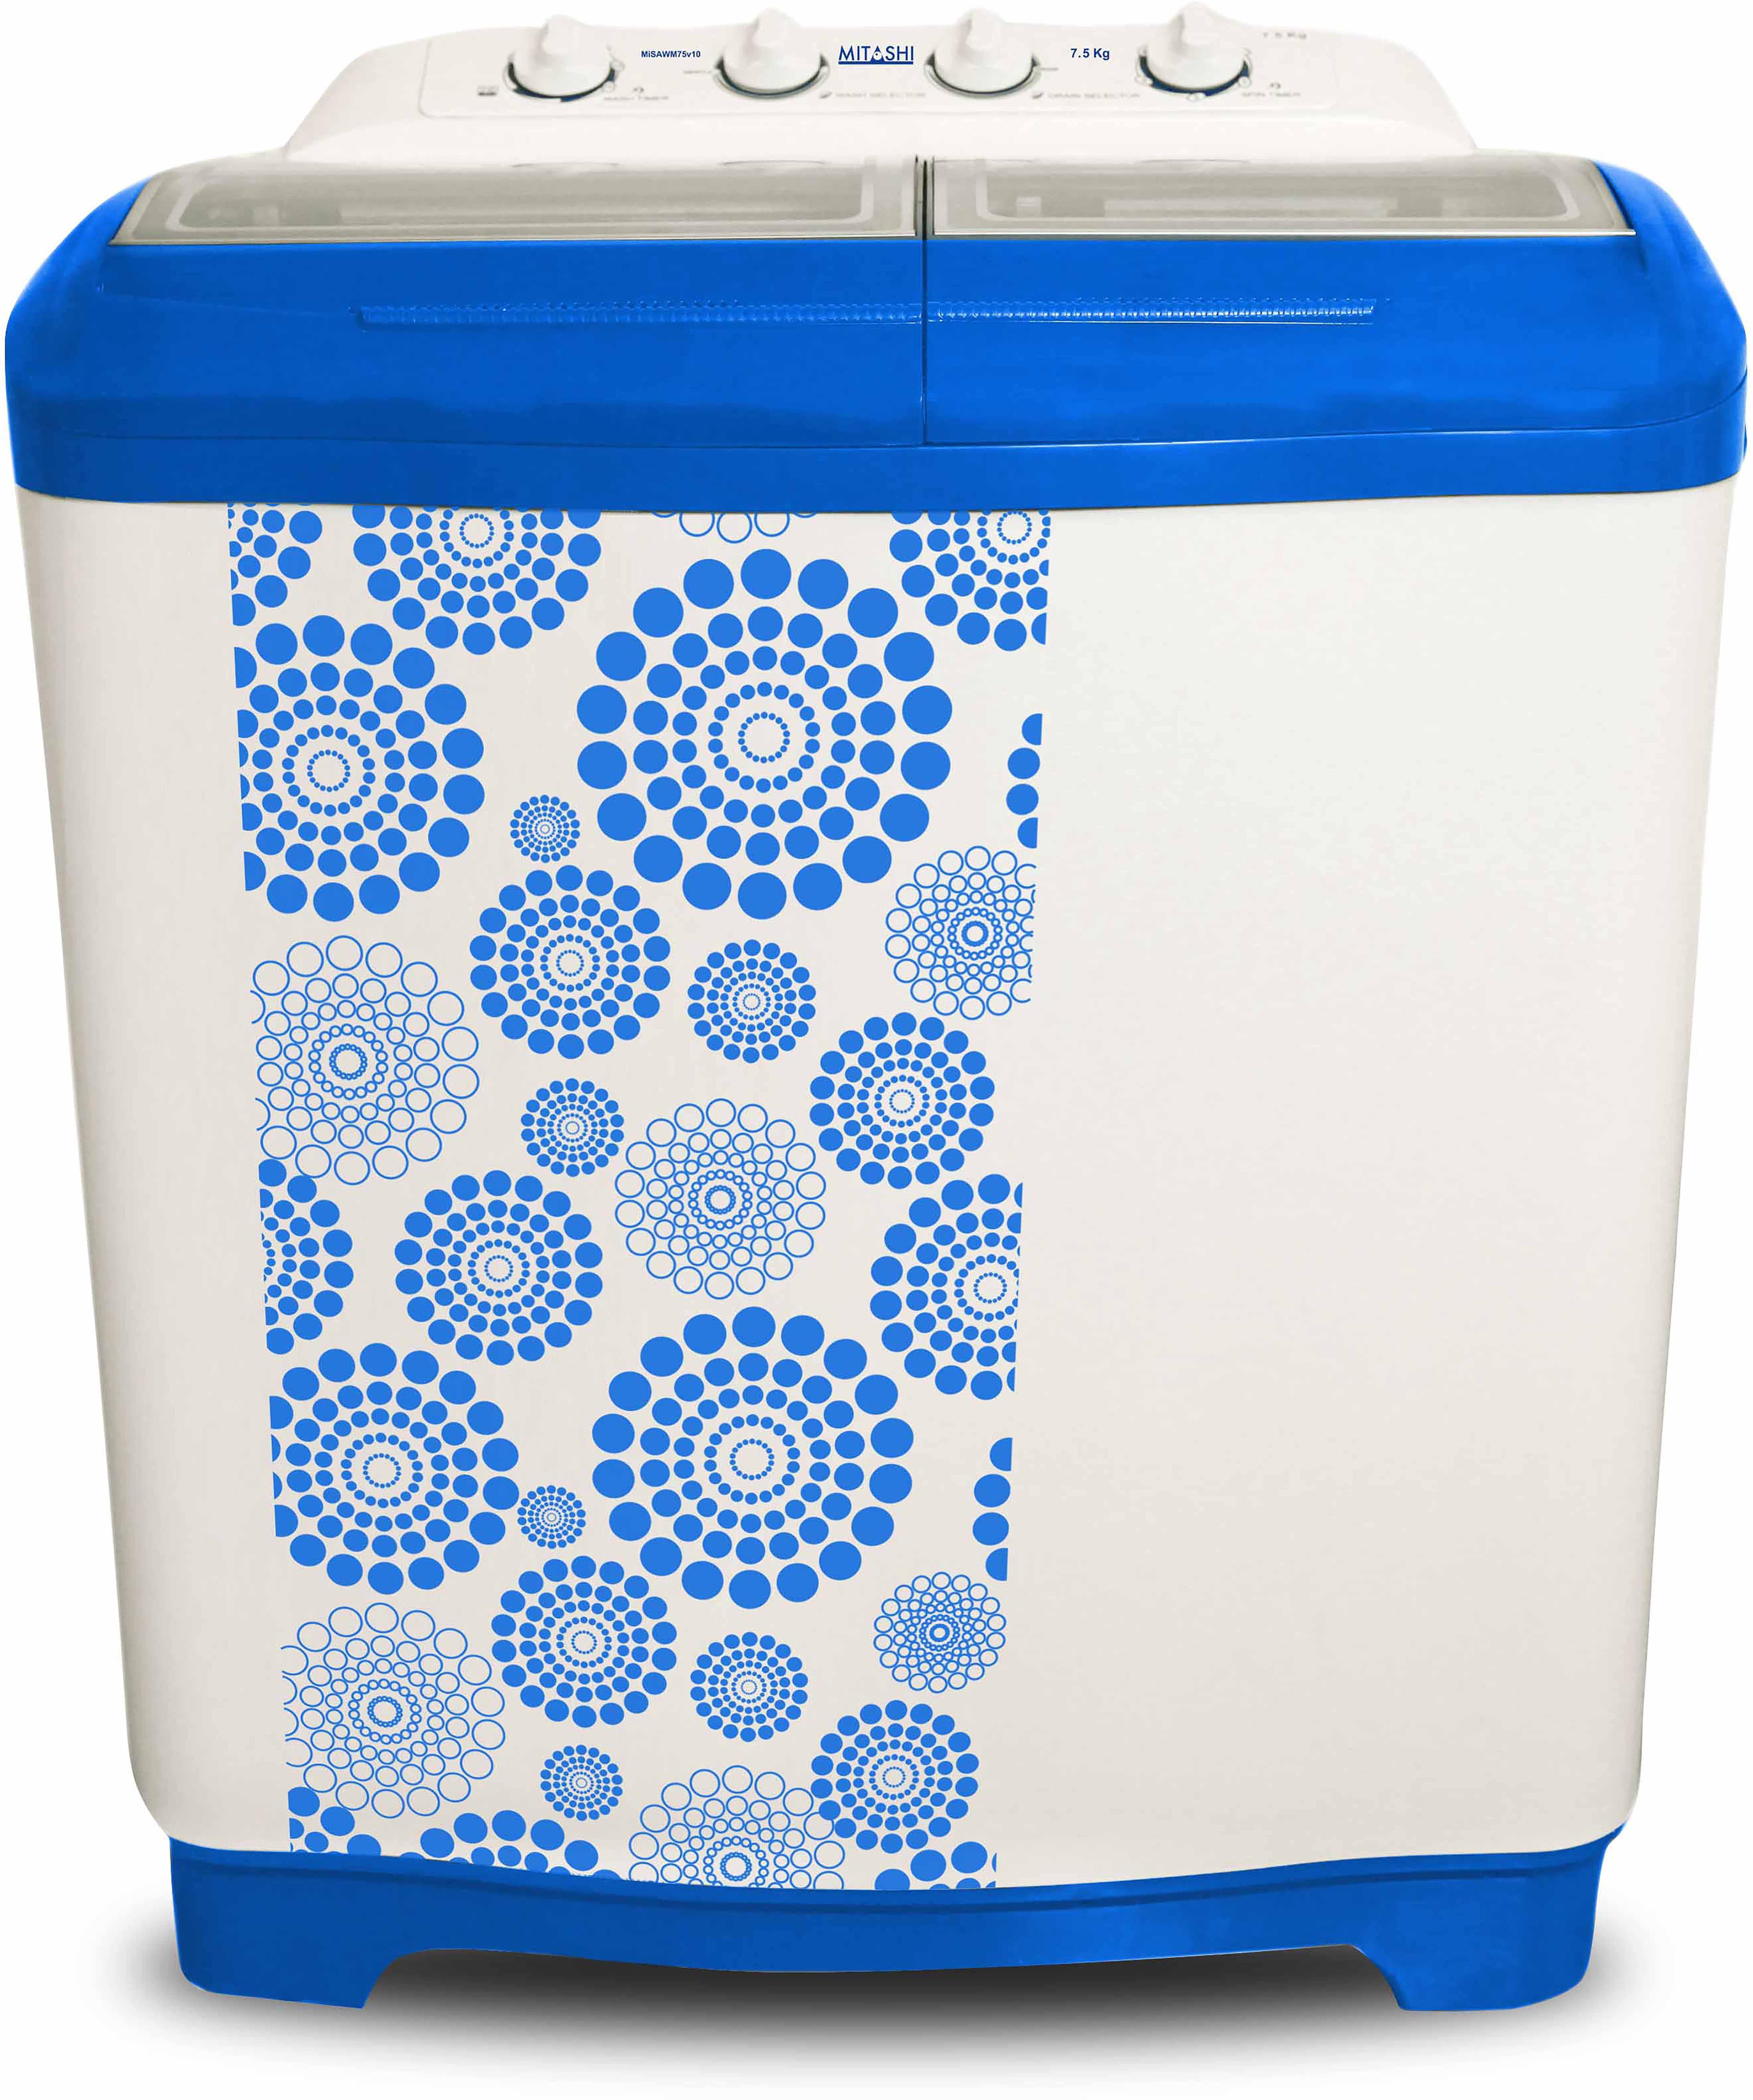 MITASHI MISAWM75V 7.5KG Semi Automatic Top Load Washing Machine